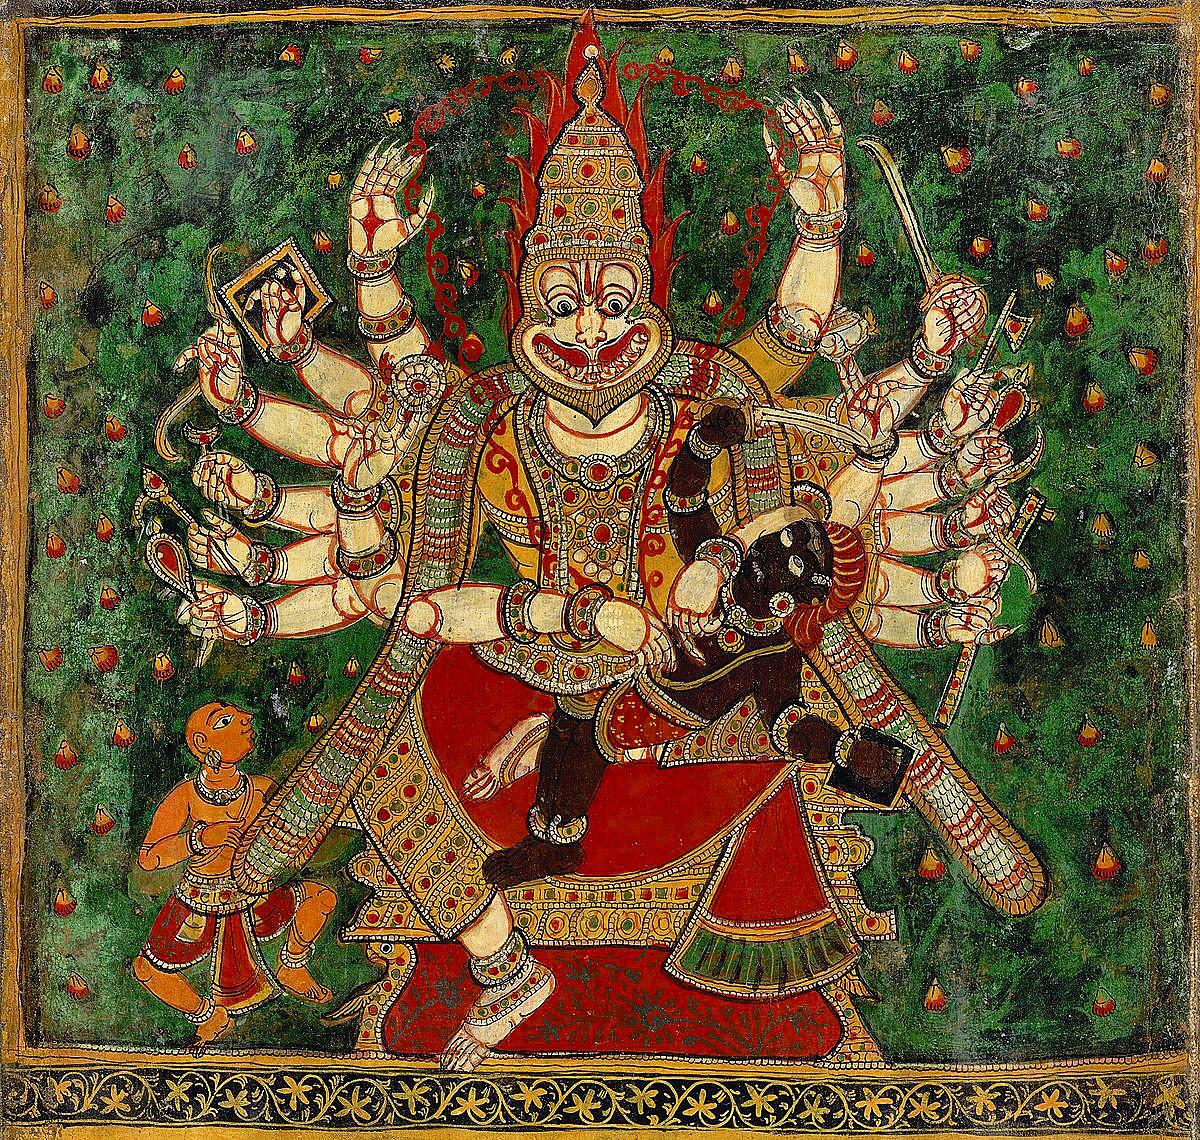 traditional painting of Sri Narasingha and Hiranyakashipu. Bhakta Prahlad is shown on the left.